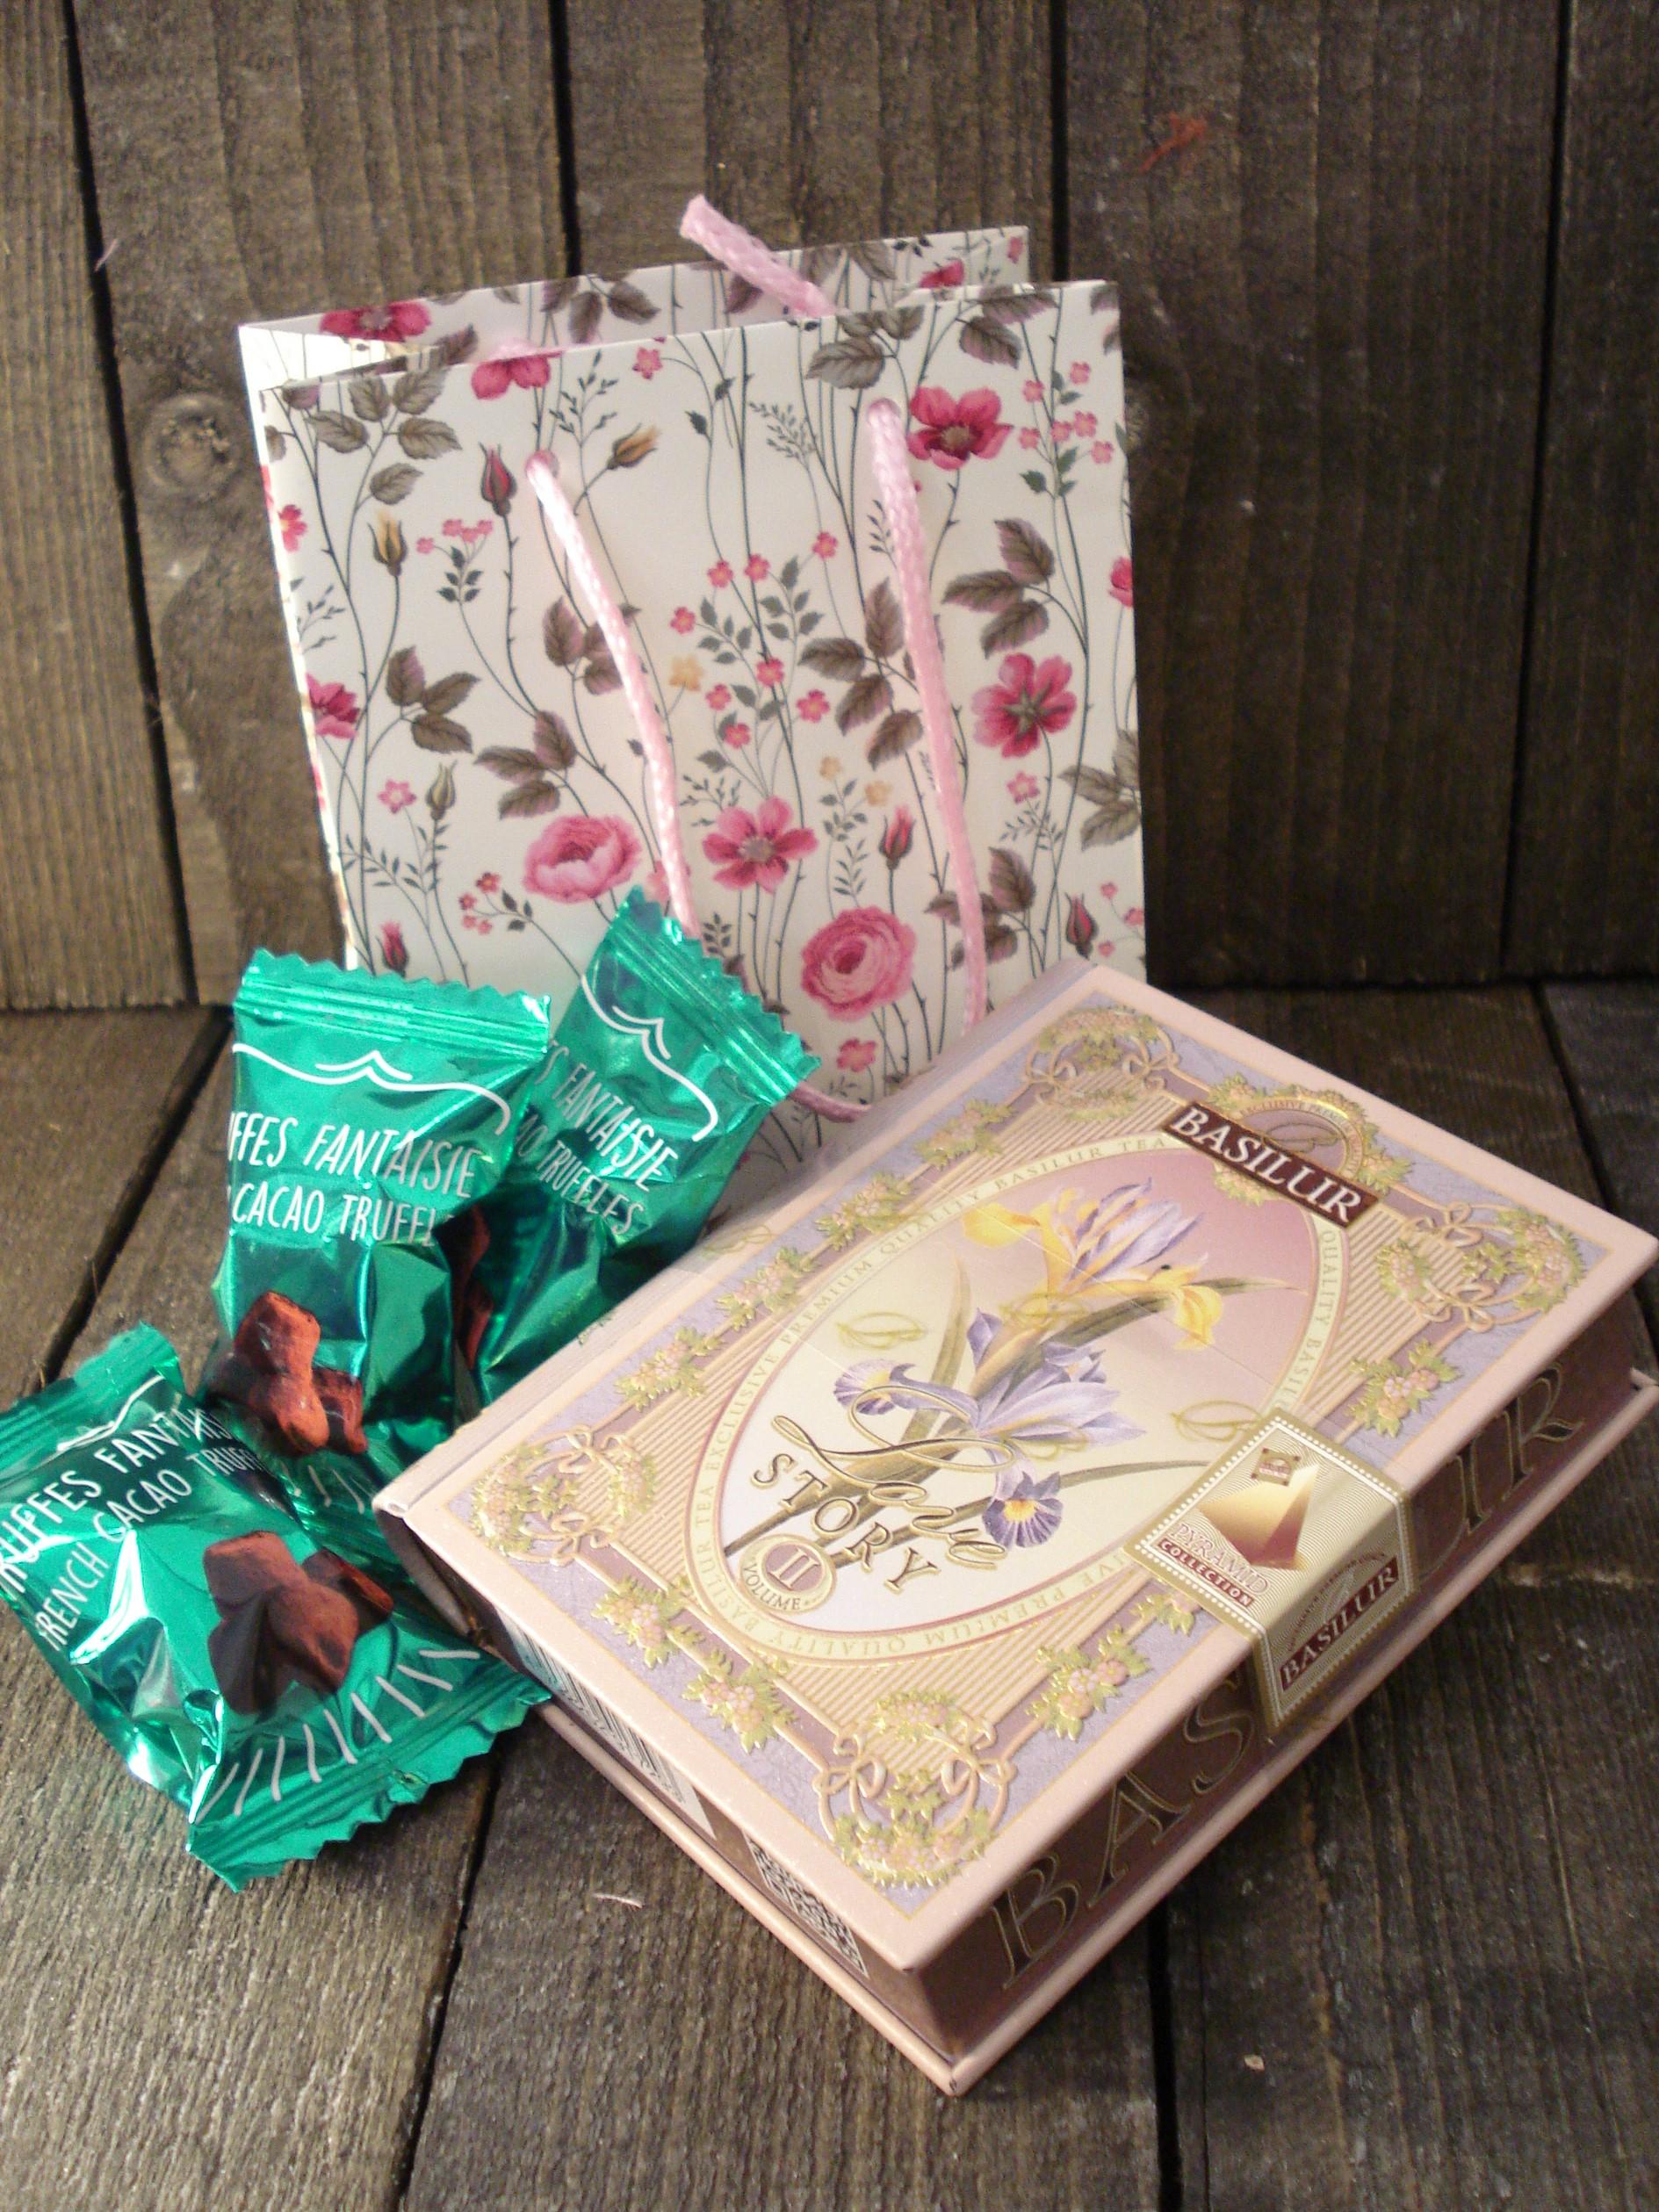 Lille te og chokolade gave